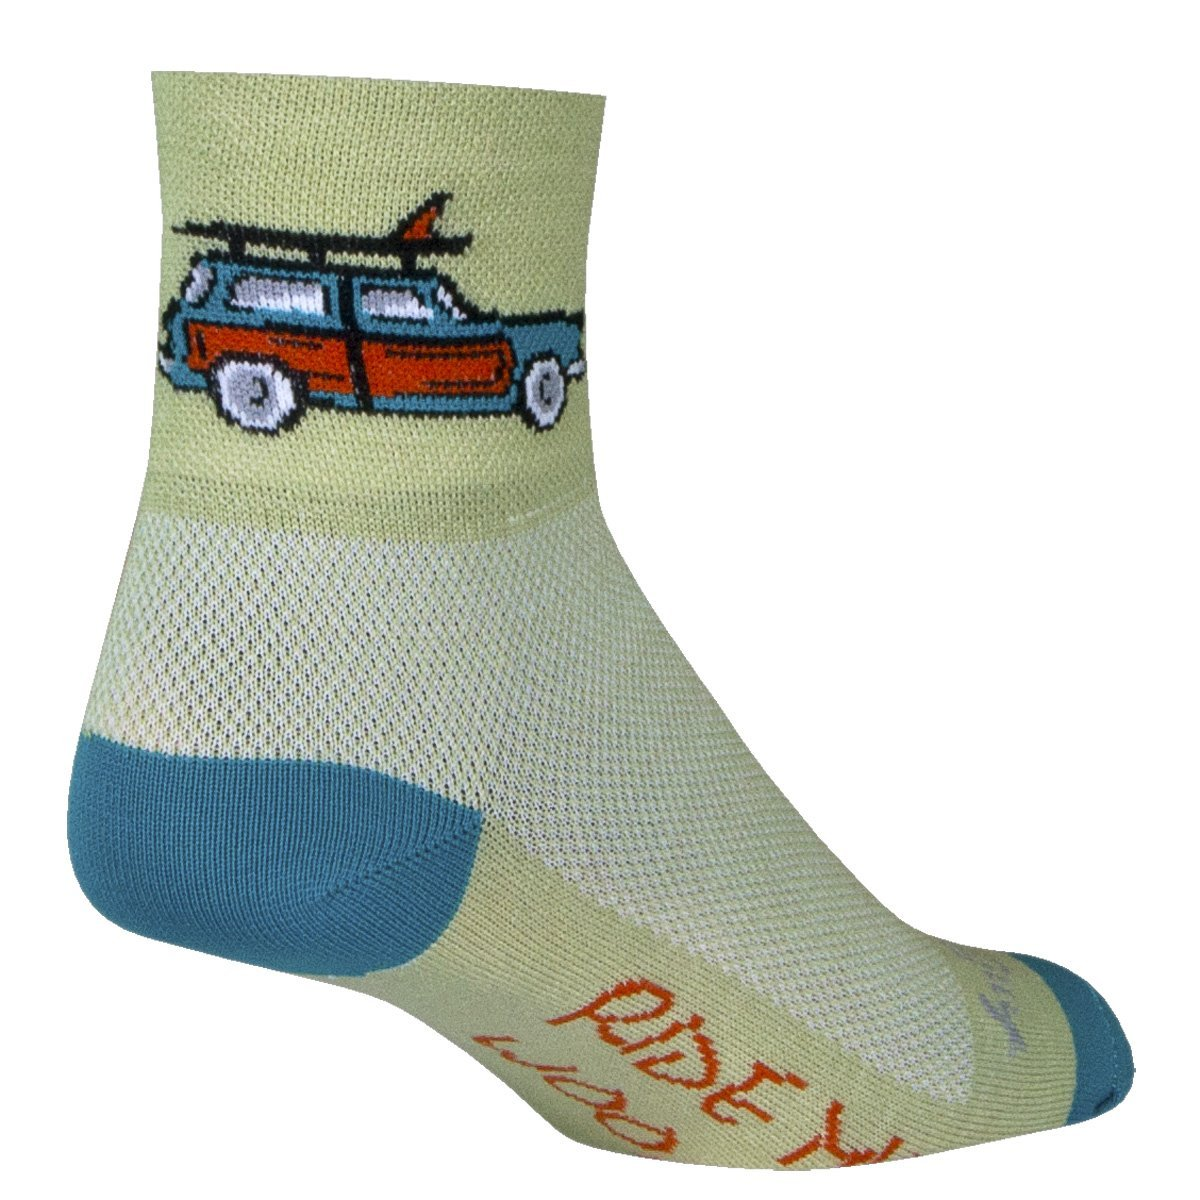 "Socks - Sockguy - Classic 3"" - Woody L/XL Cycling/Running"